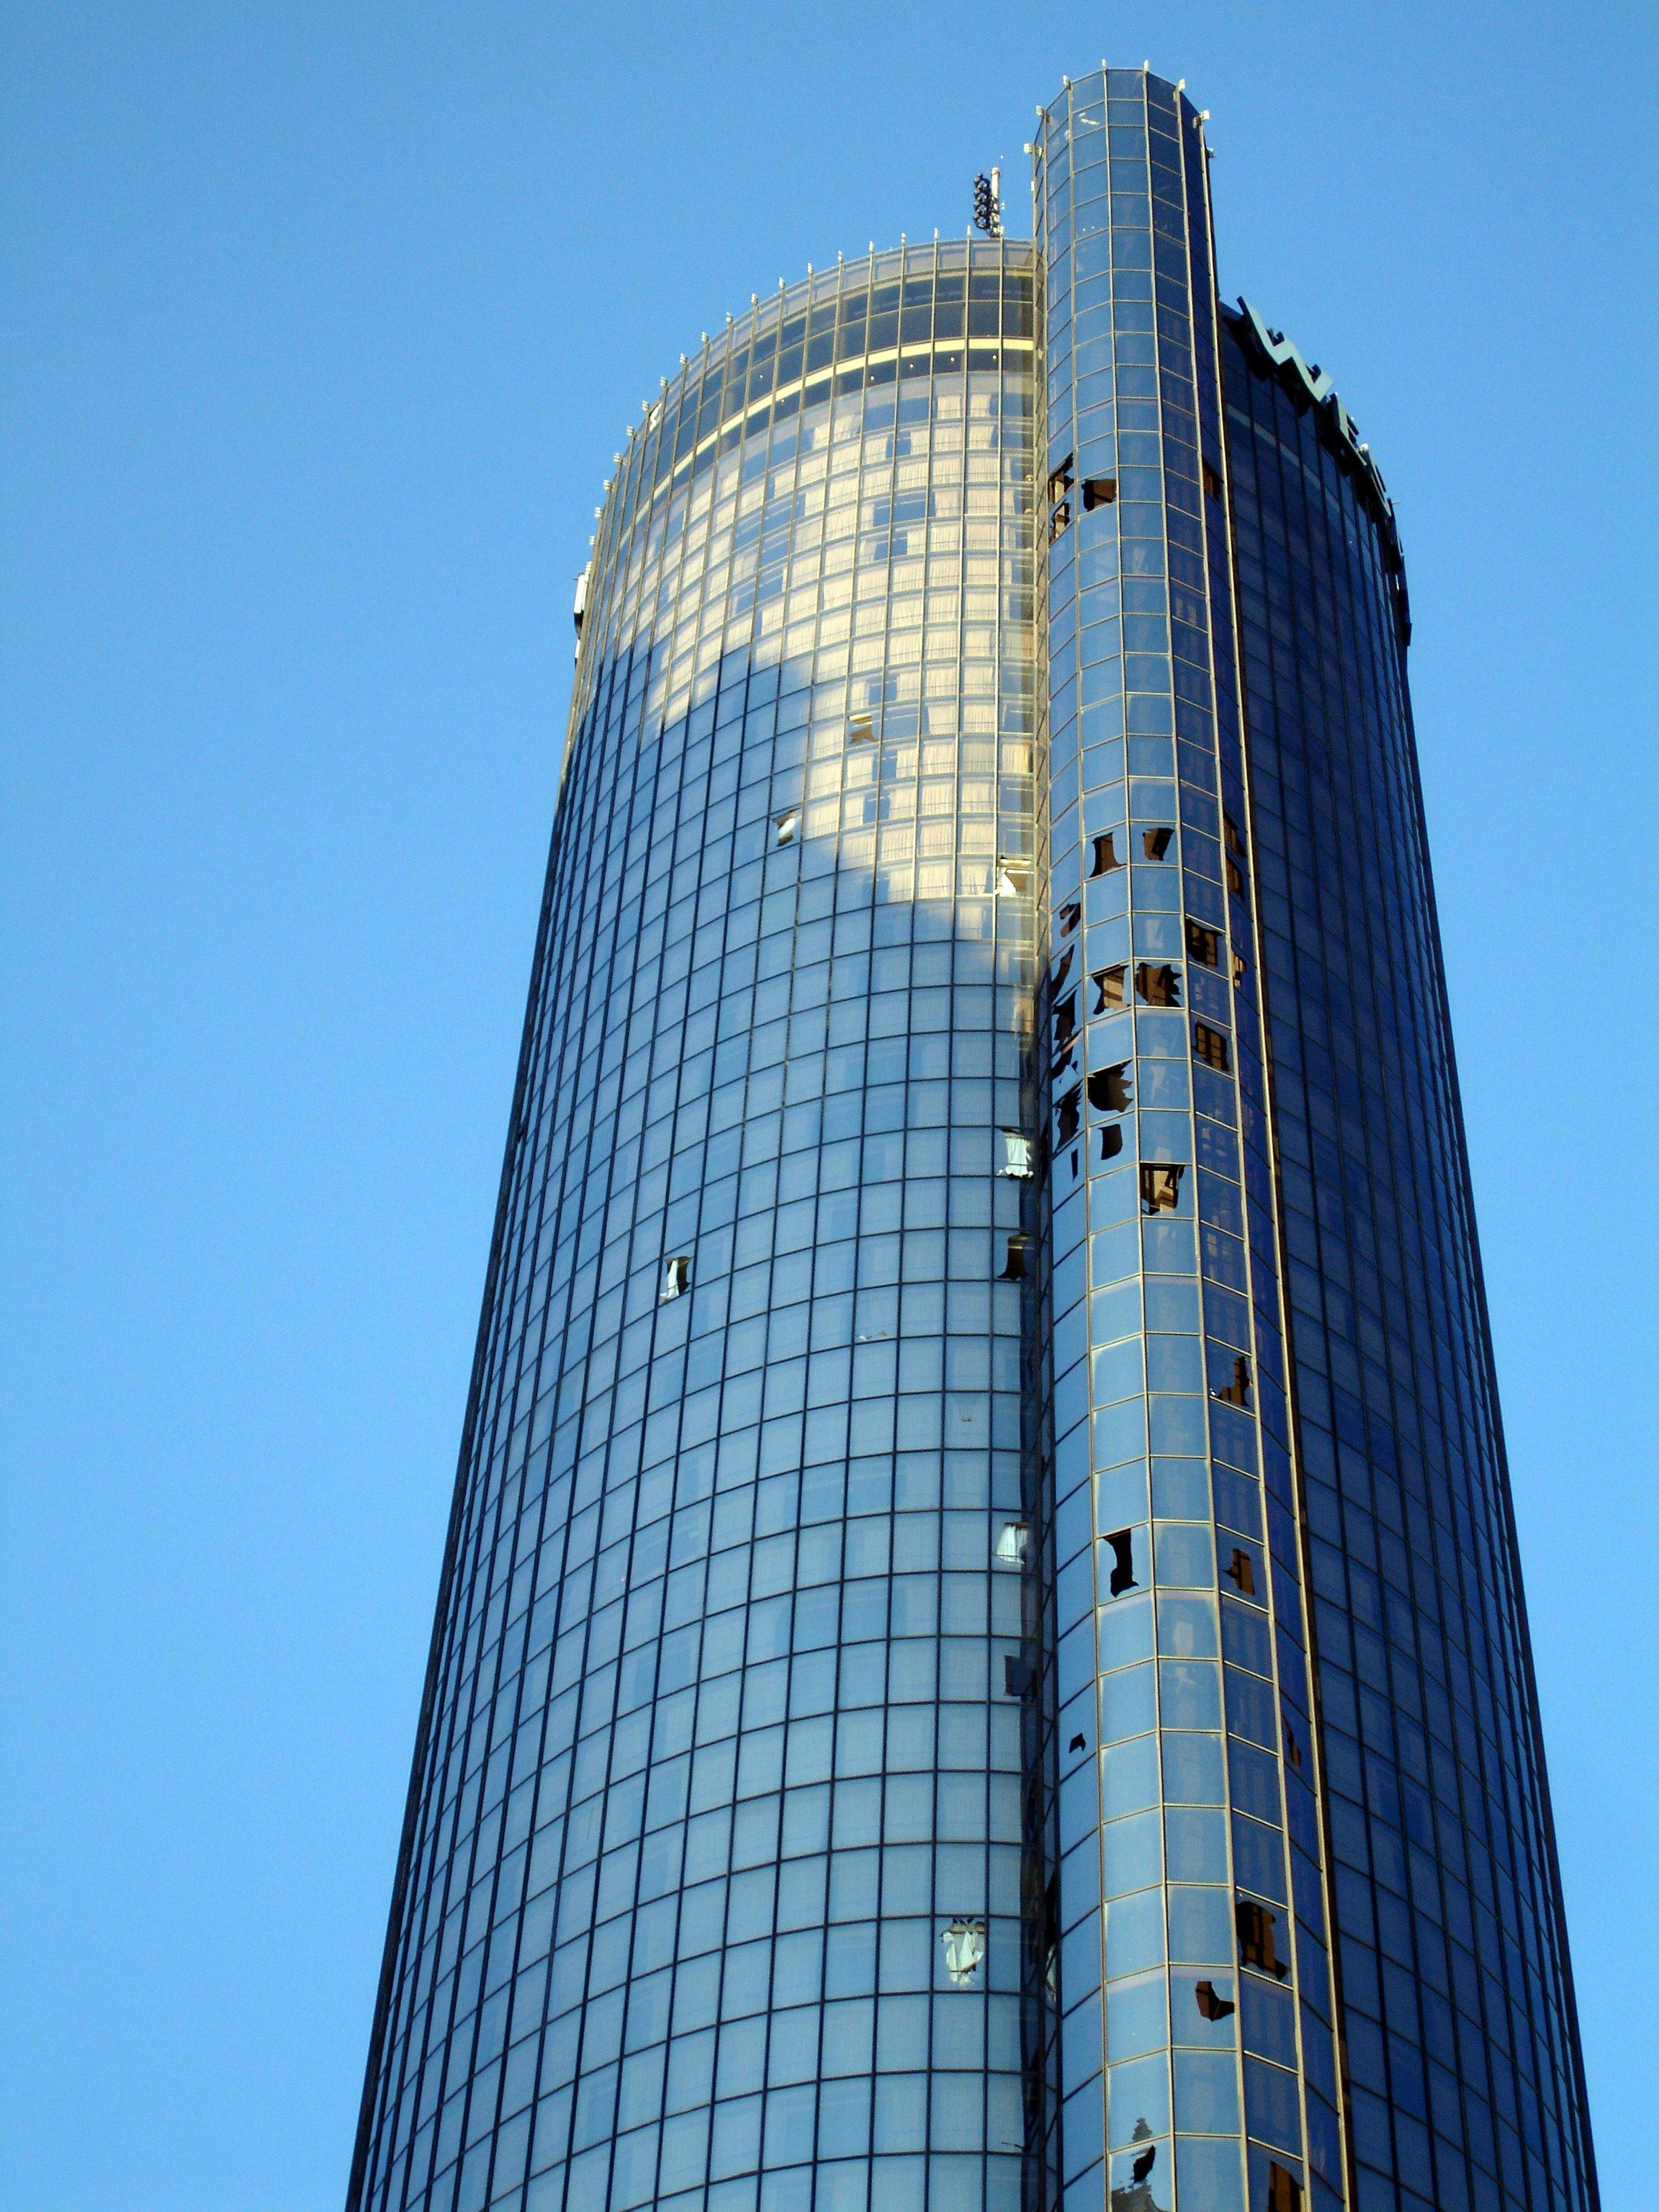 2008 Atlanta Tornado Outbreak Wikiwand